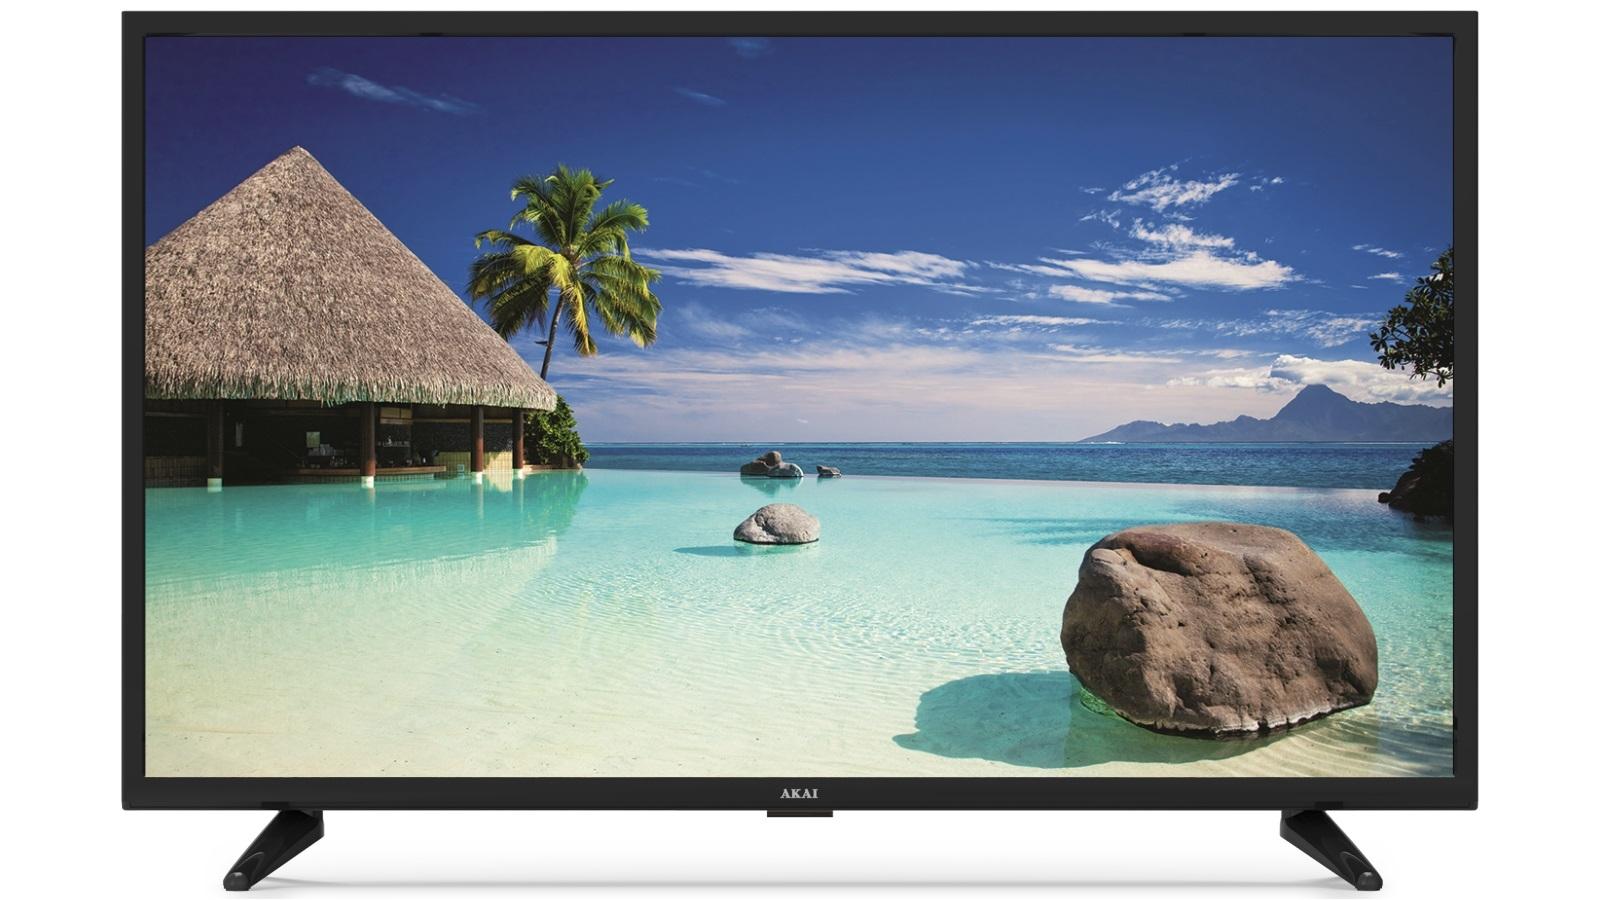 Cheap Akai 32-inch HD LED LCD Smart TV | Harvey Norman AU